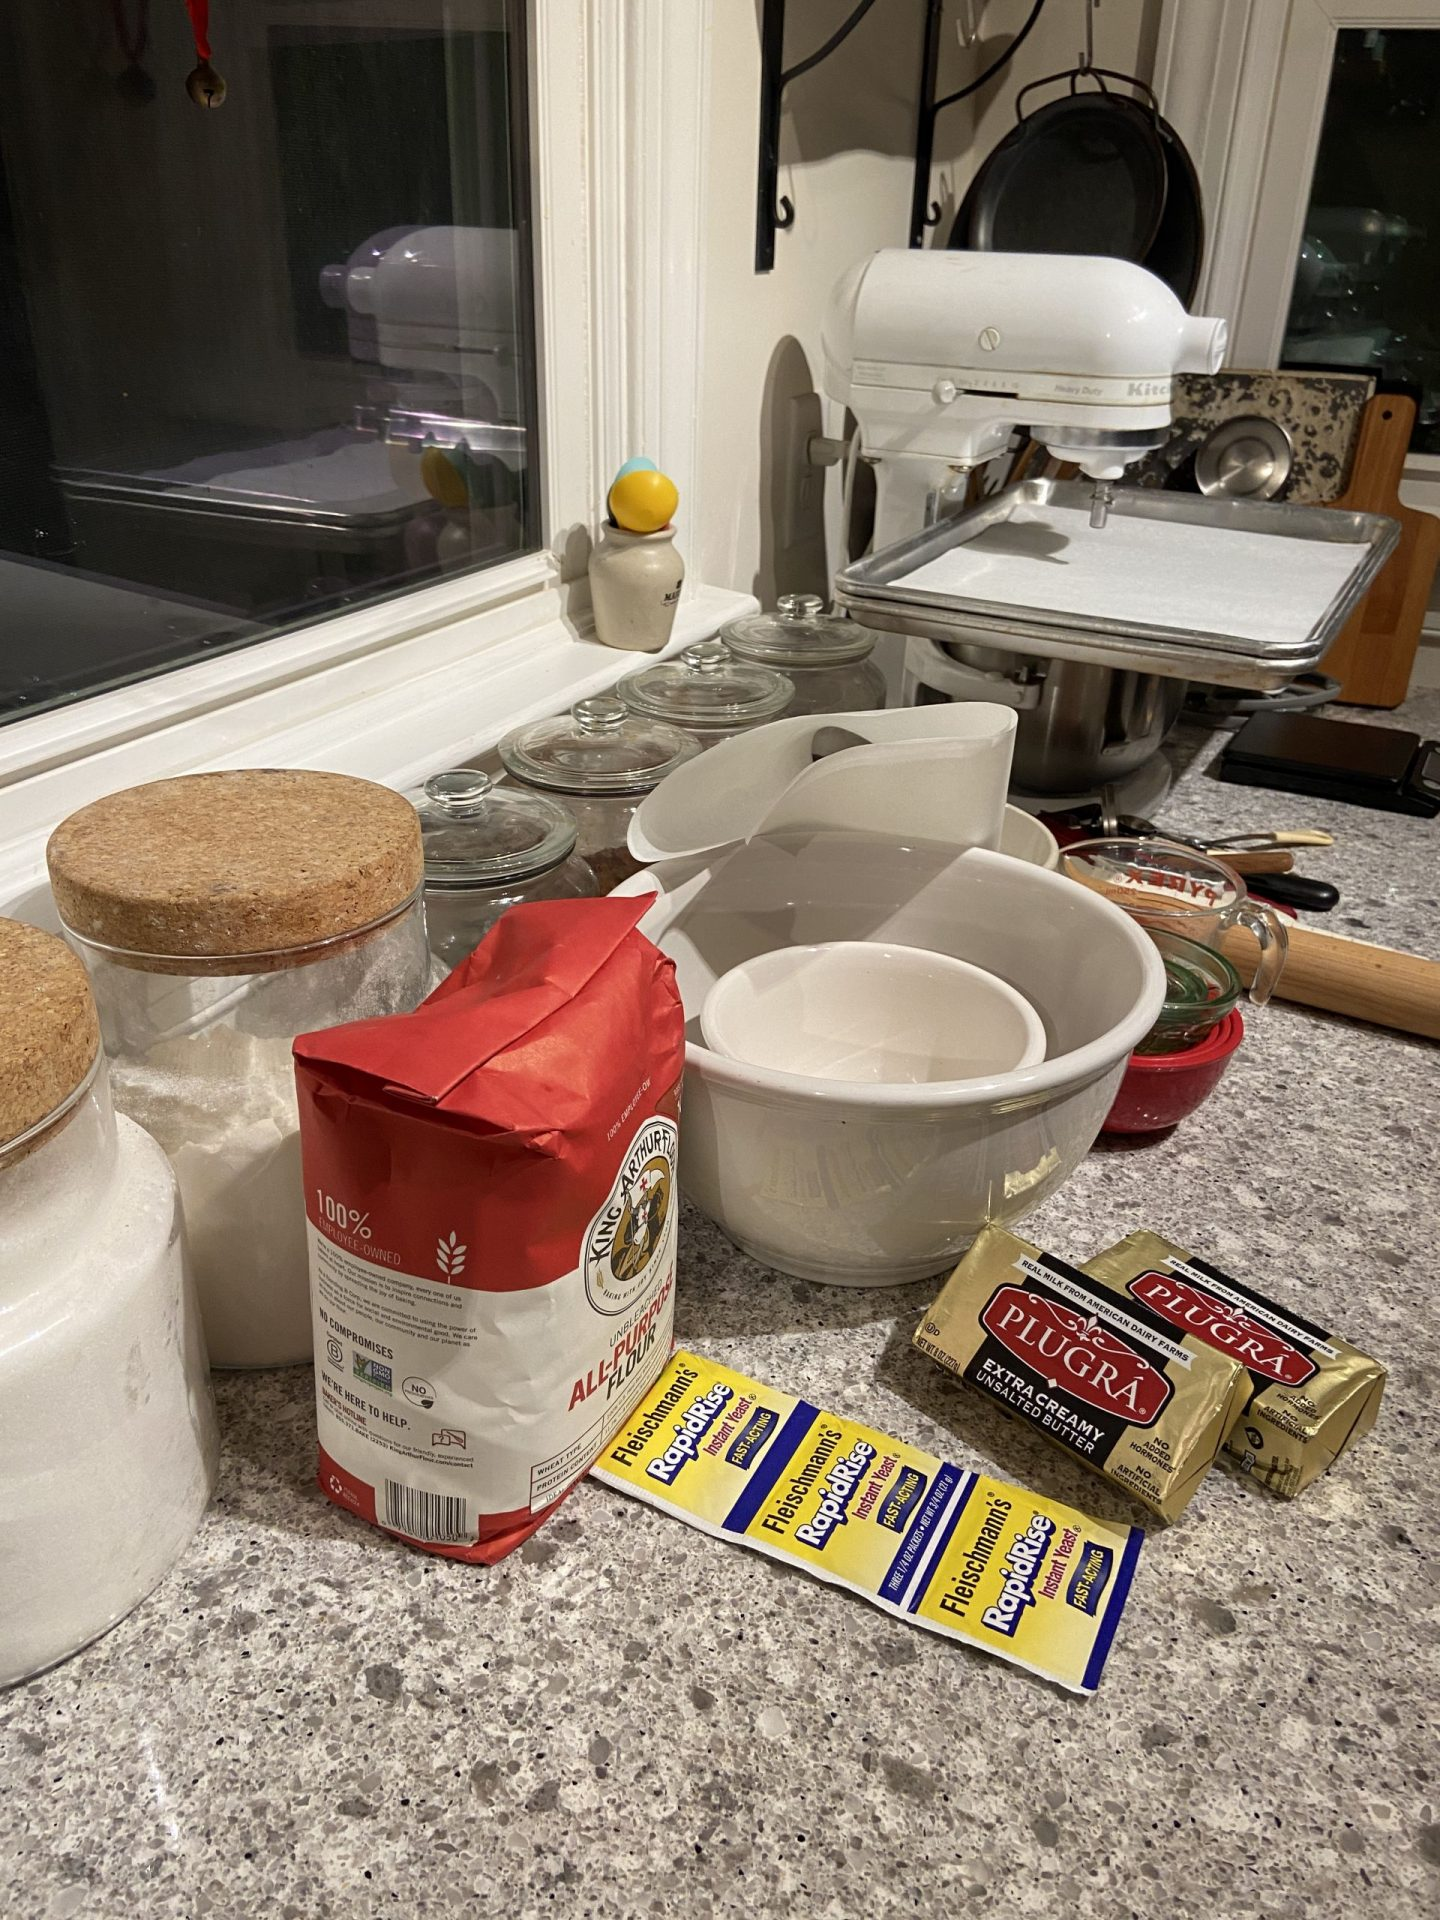 croissants eatbaketravel.com